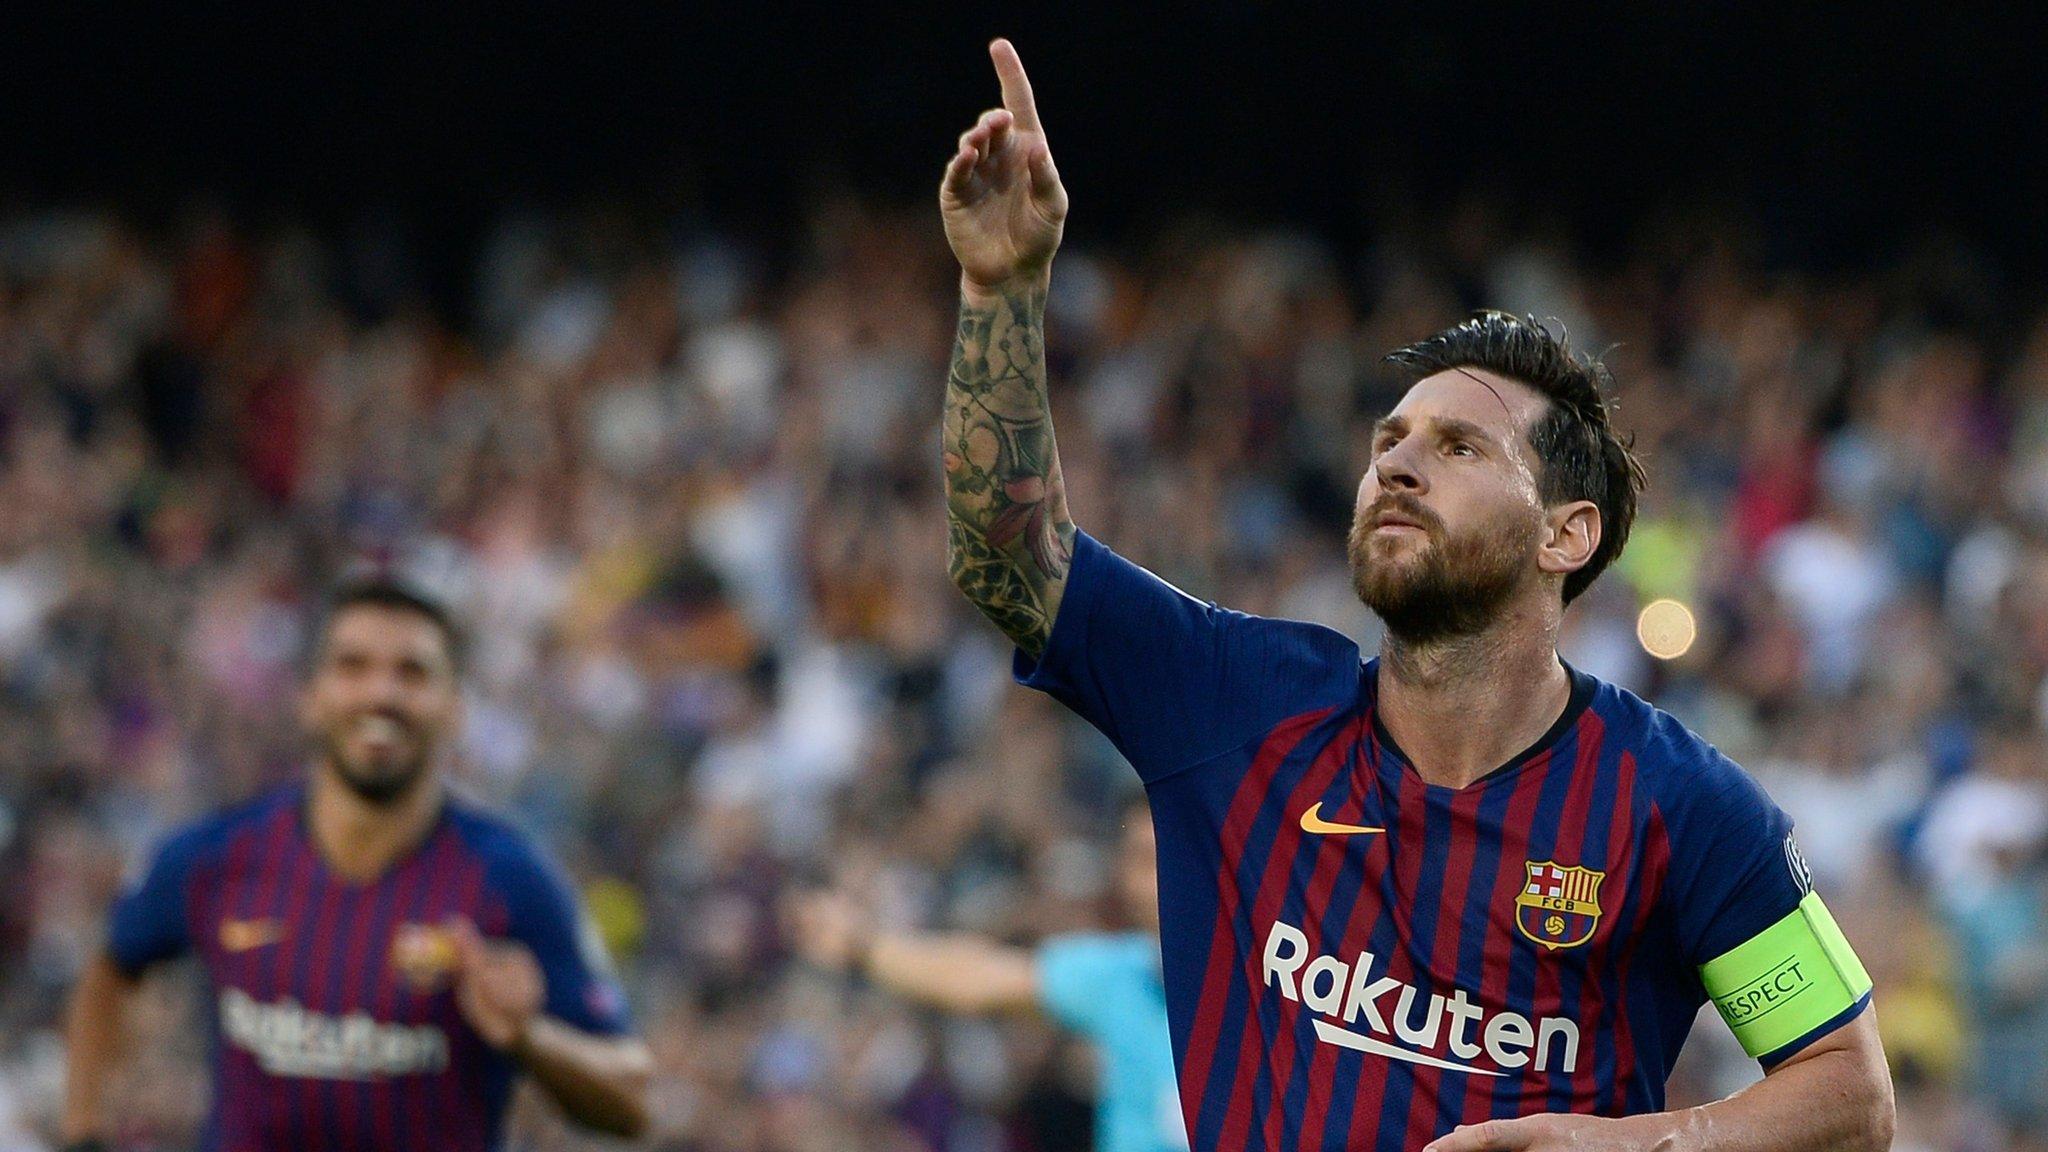 Barcelona 4-0 PSV Eindhoven: Lionel Messi scores hat-trick in Champions League win